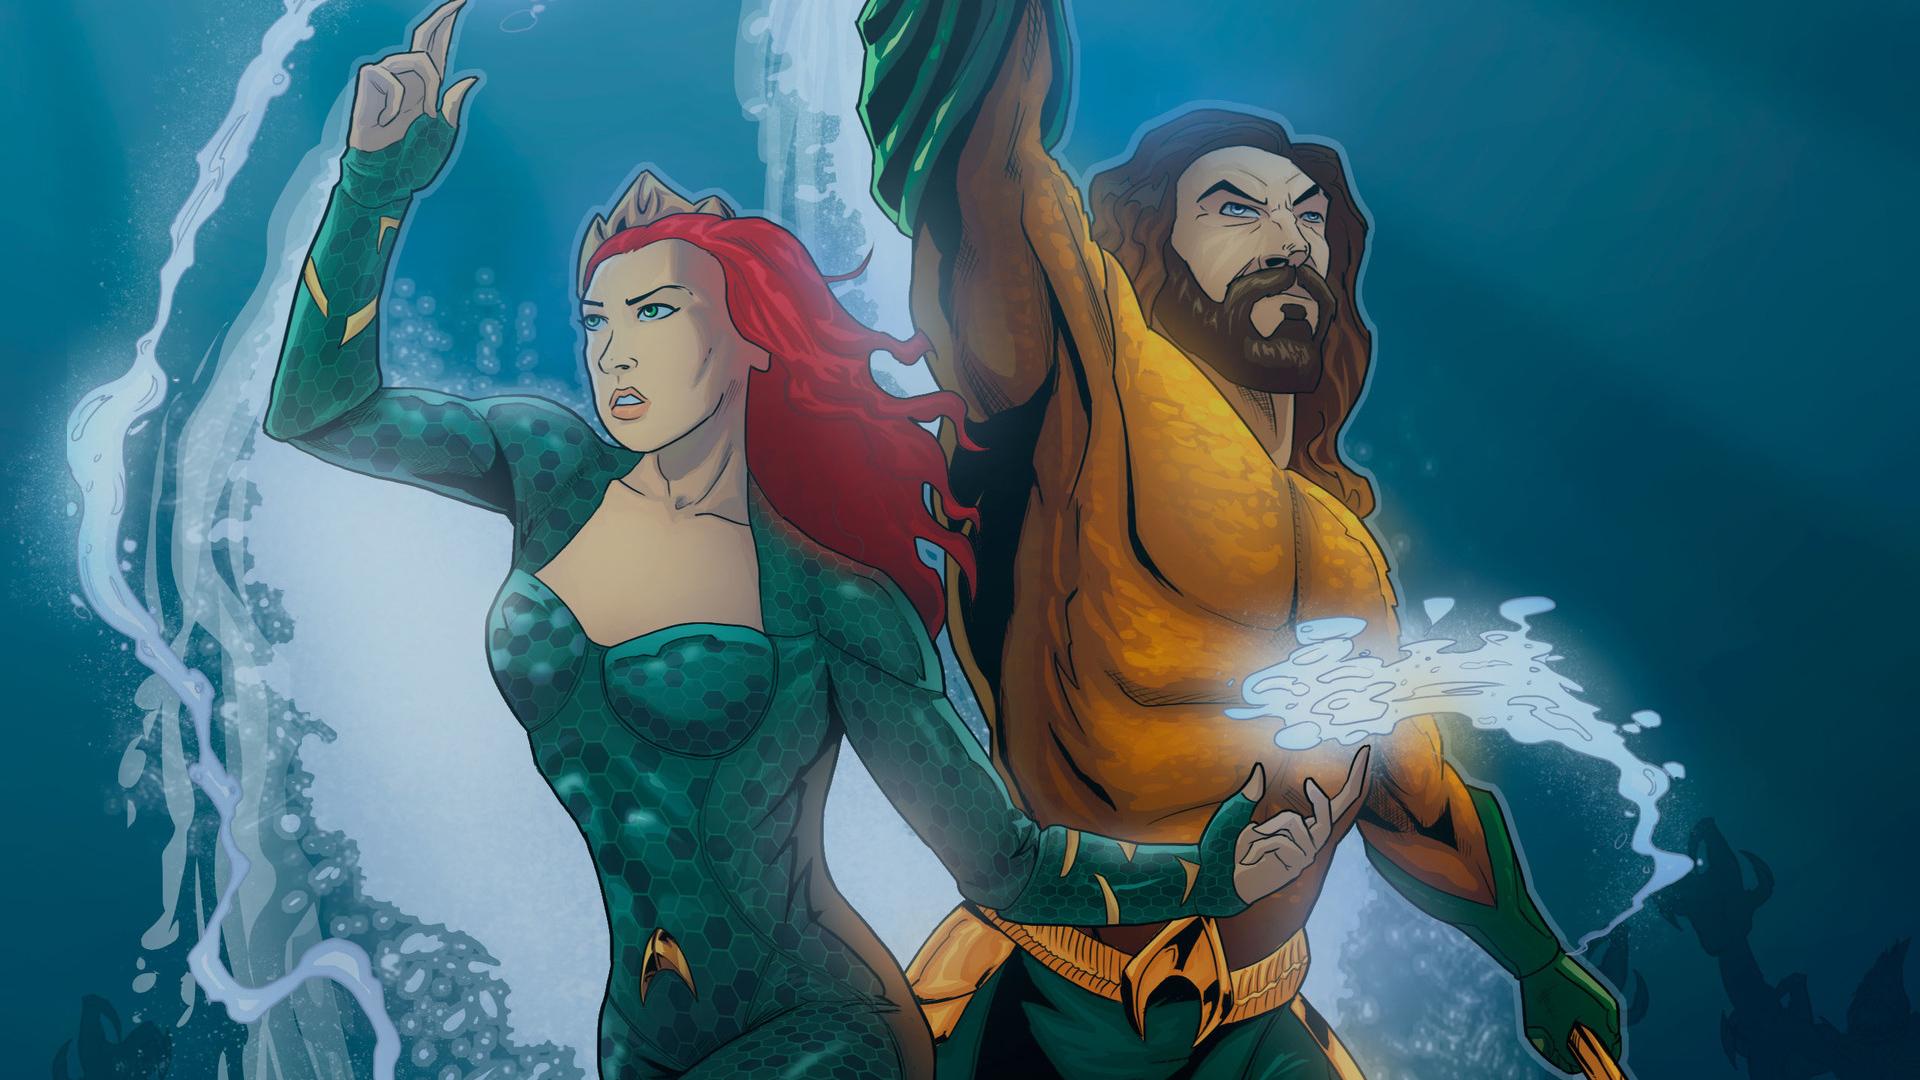 2048x1152 Aquaman And Mera 2048x1152 Resolution Hd 4k Wallpapers